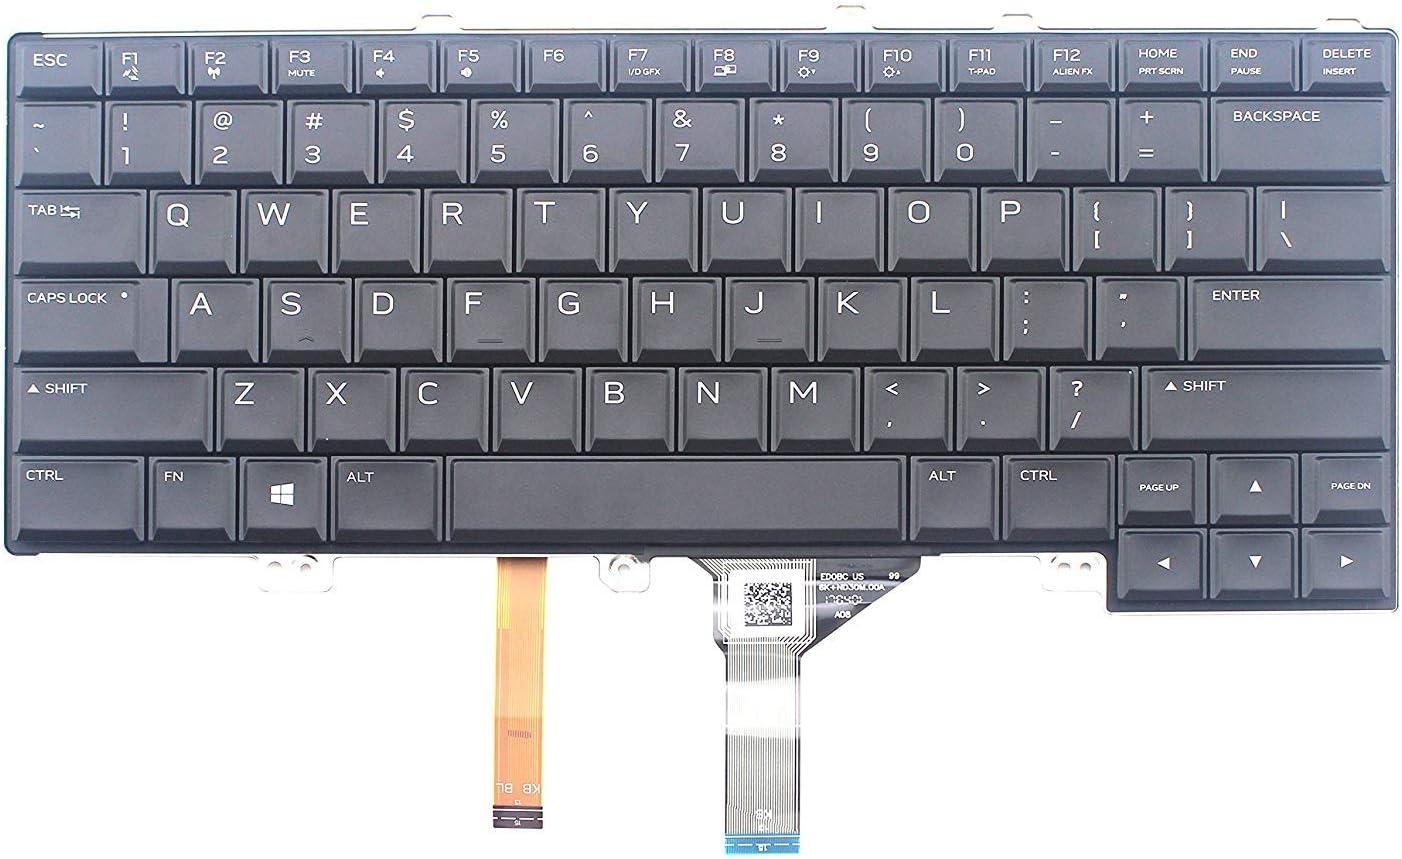 4K8F6 Dell Alienware 13 15 R2 ENGLISH International NSK-LB1BC 1D Keyboard